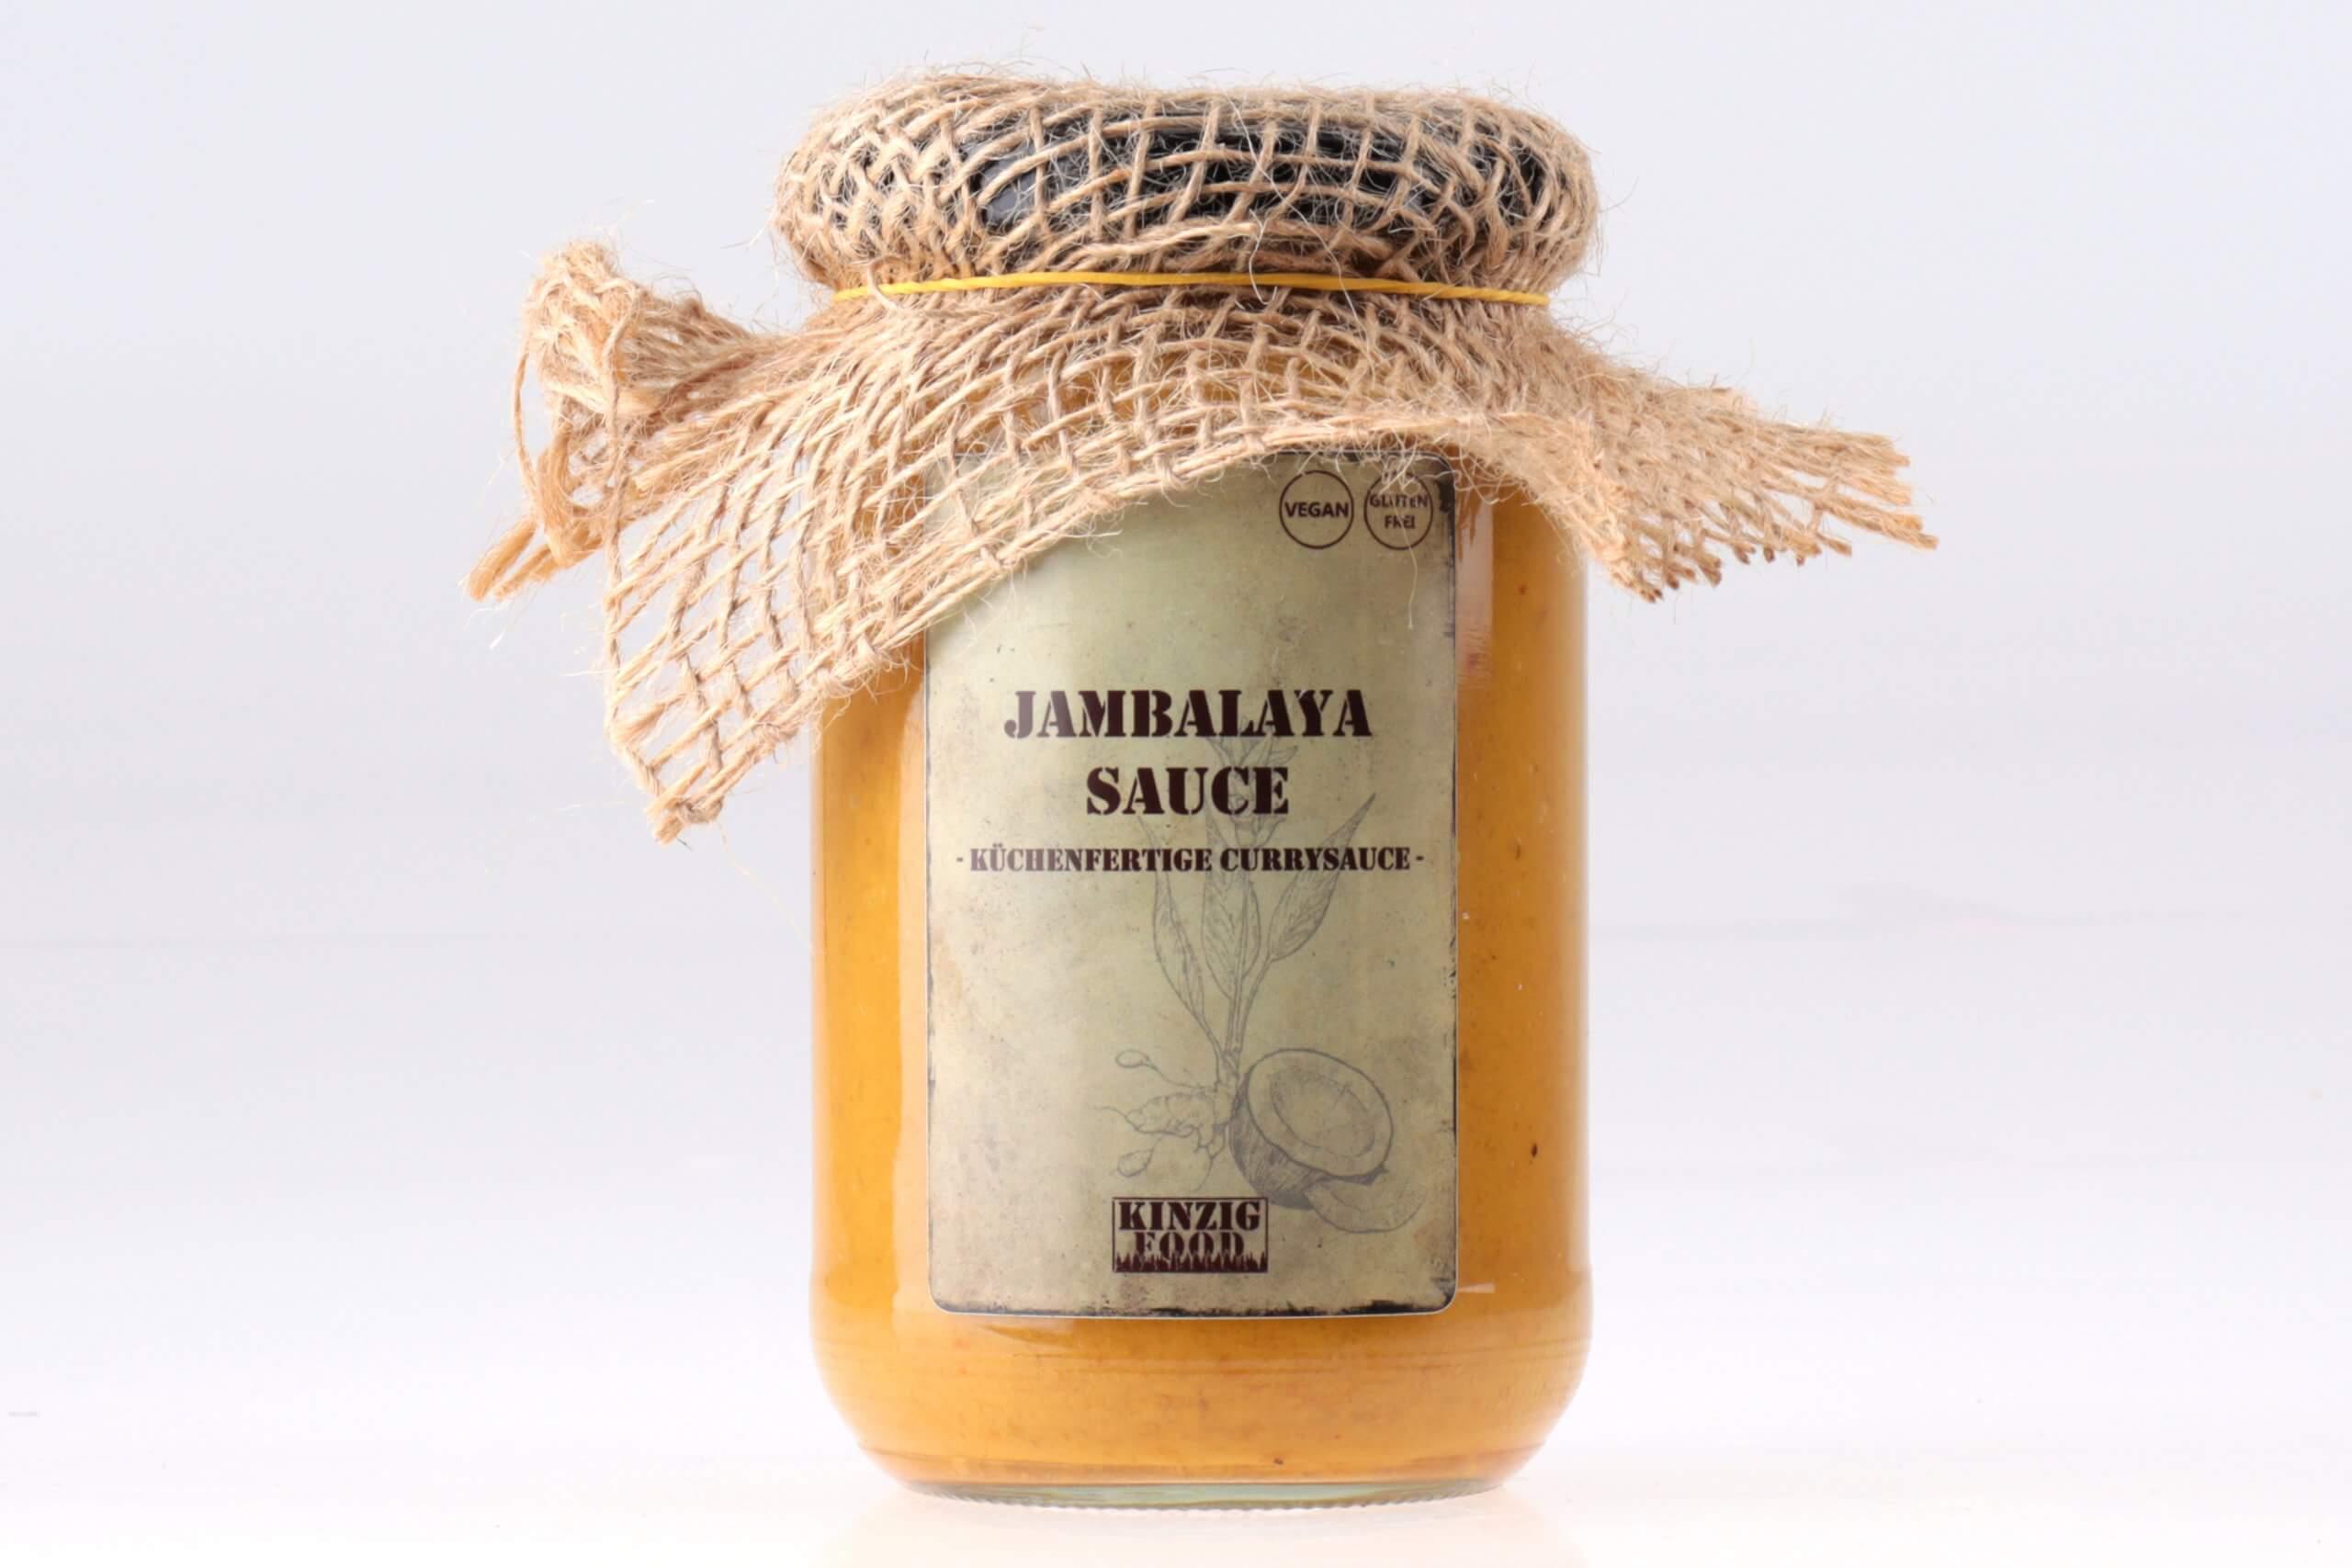 Jambalaya Sauce von feinjemacht